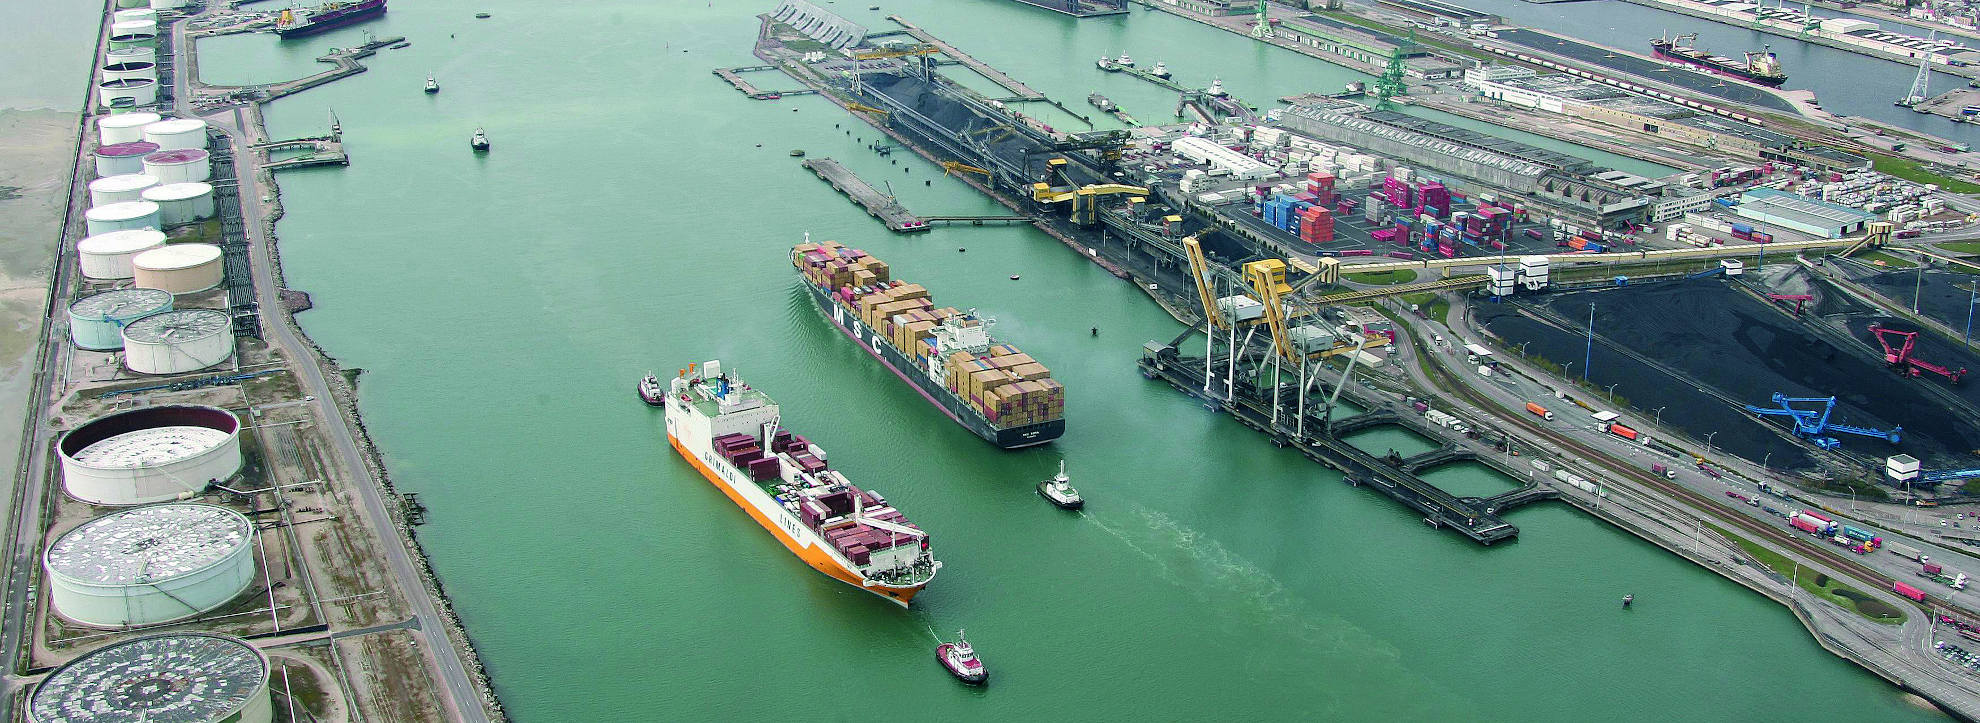 Port du Havre - Equipements portuaires